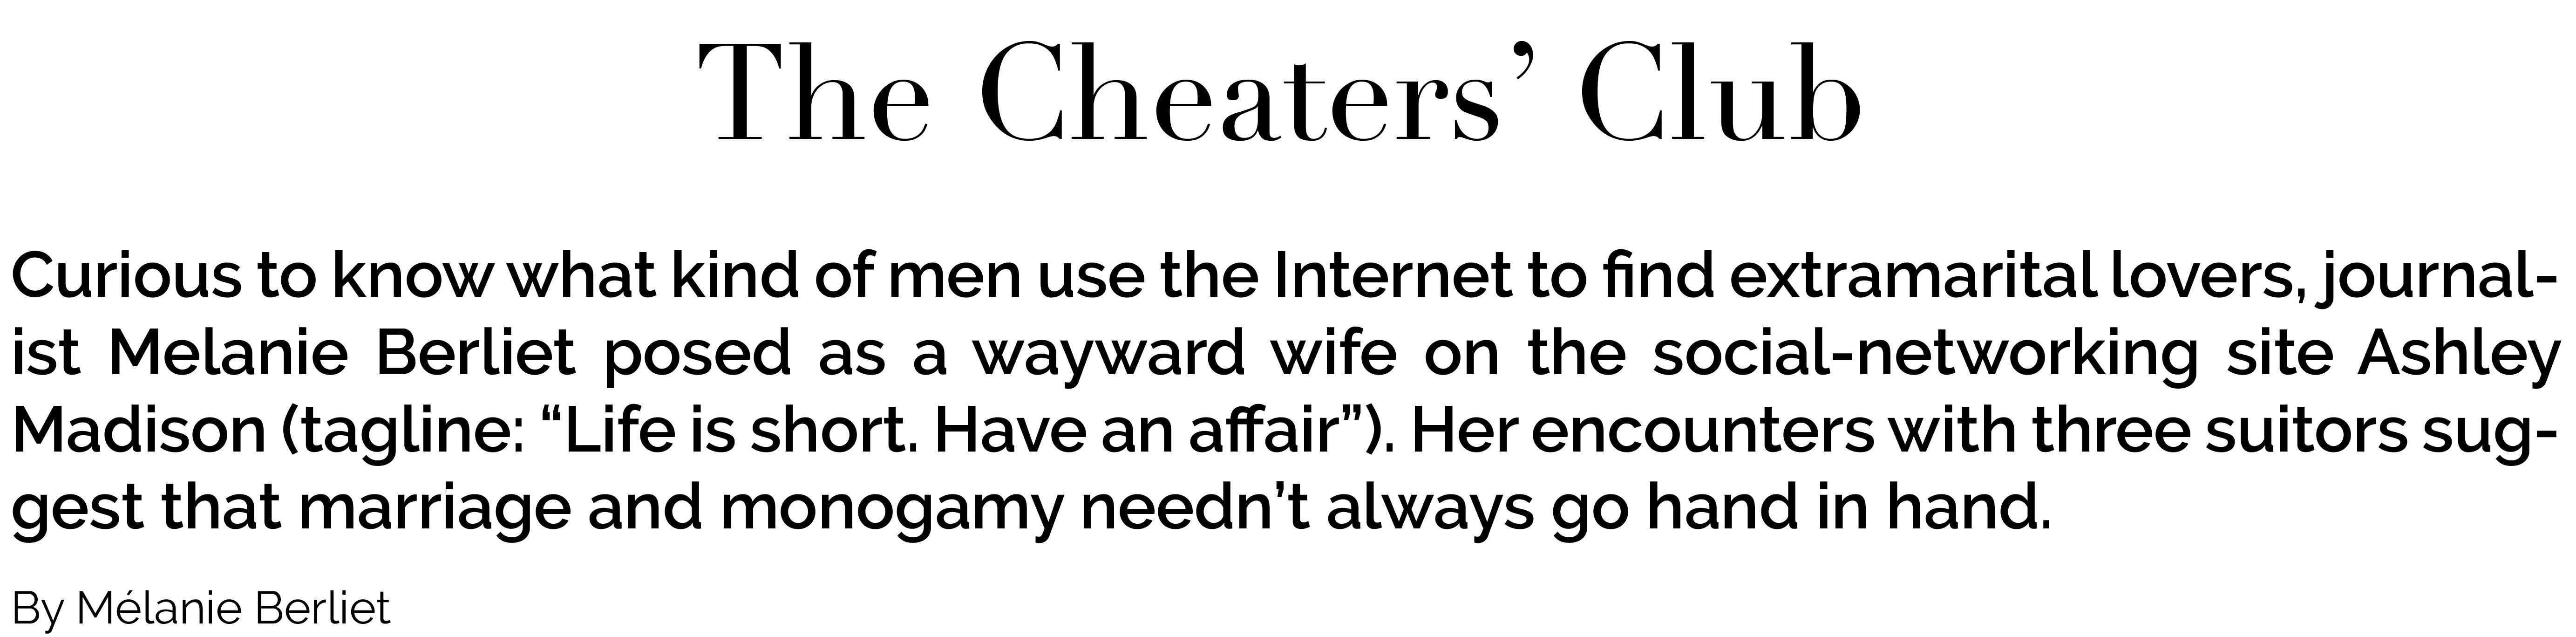 The Cheaters Club Mlanie Berliet